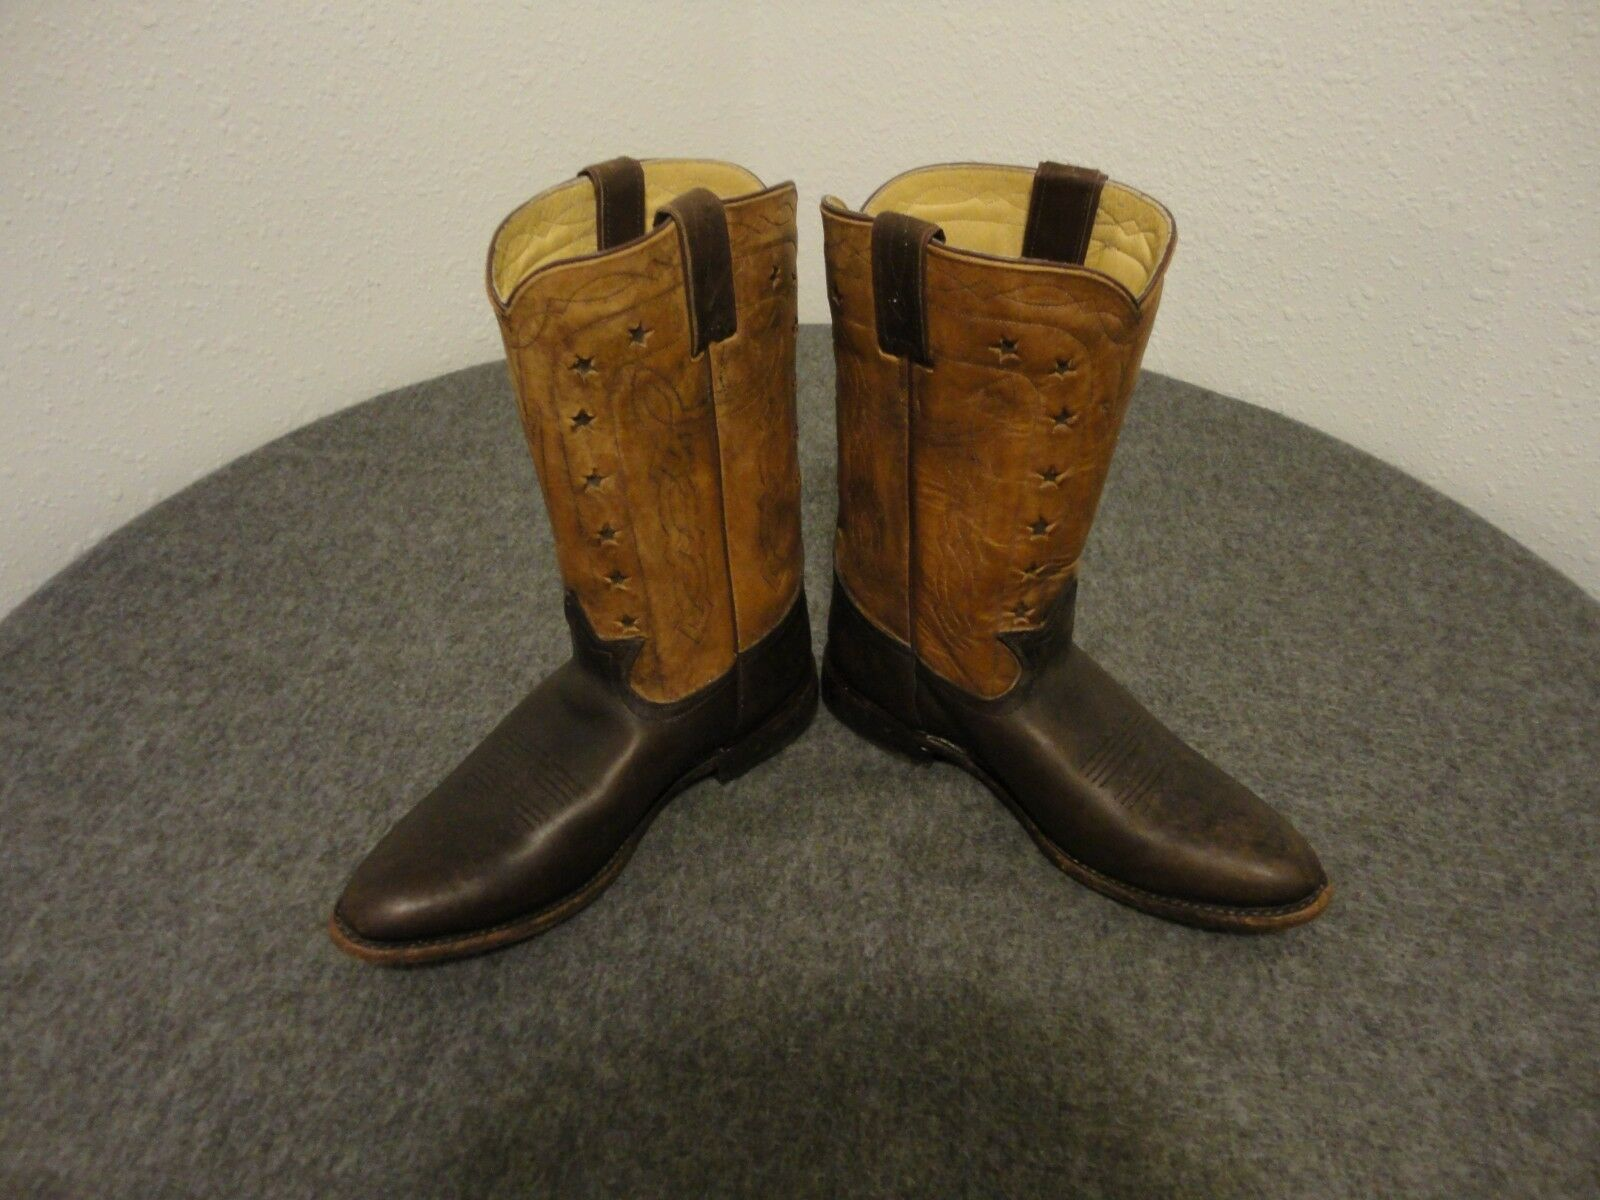 Frye Cow-Boy Cuir Gravé Femmes bottes-76808- Marron Taille 9.5 B- ( Belk 125)